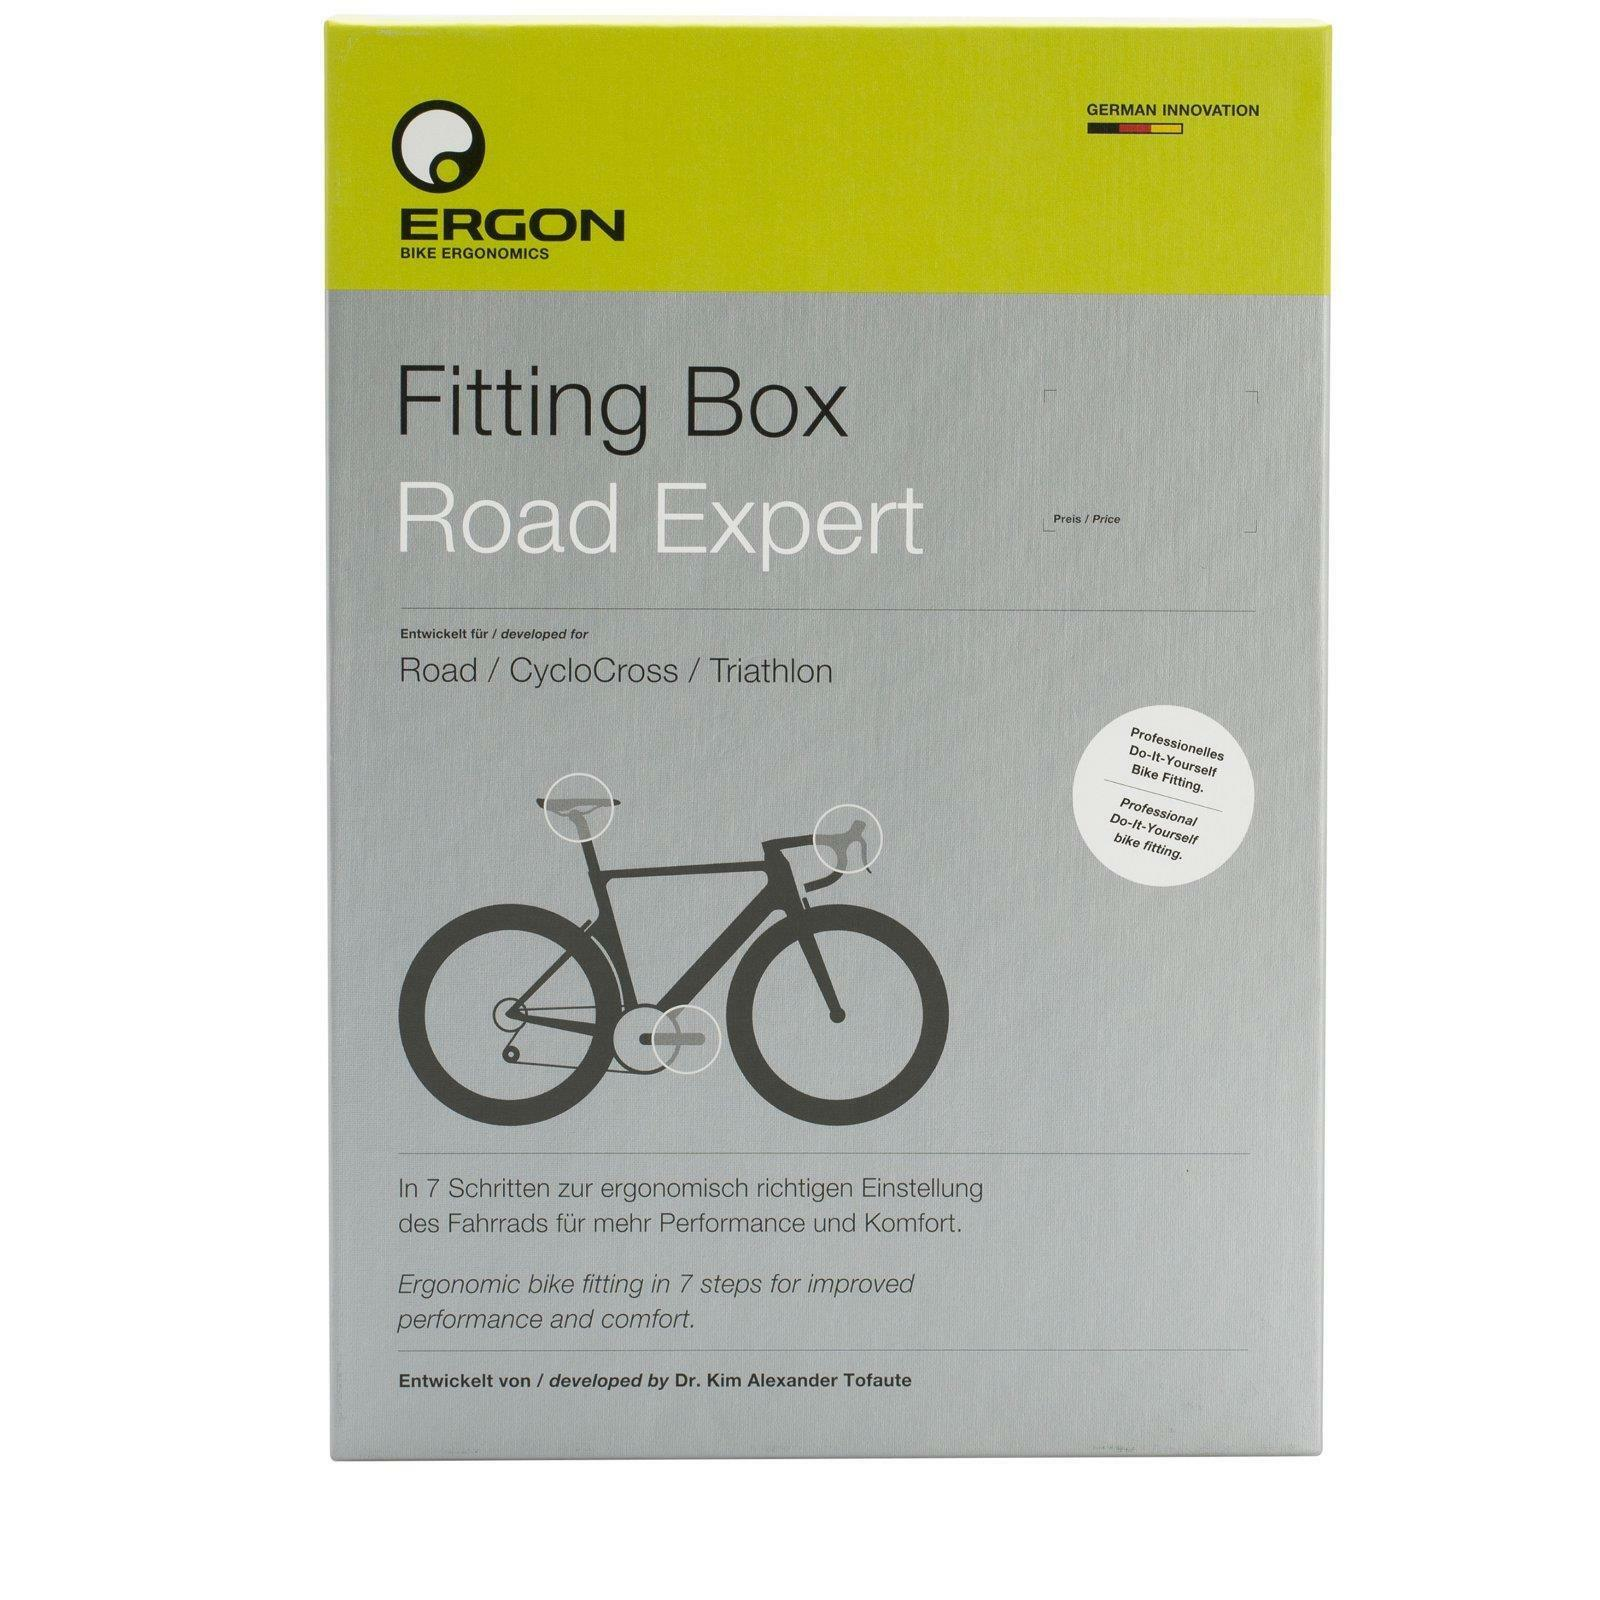 Ergon Fitting Box Road Expert Einstellhilfe Komfort Performance Anpassung Bike